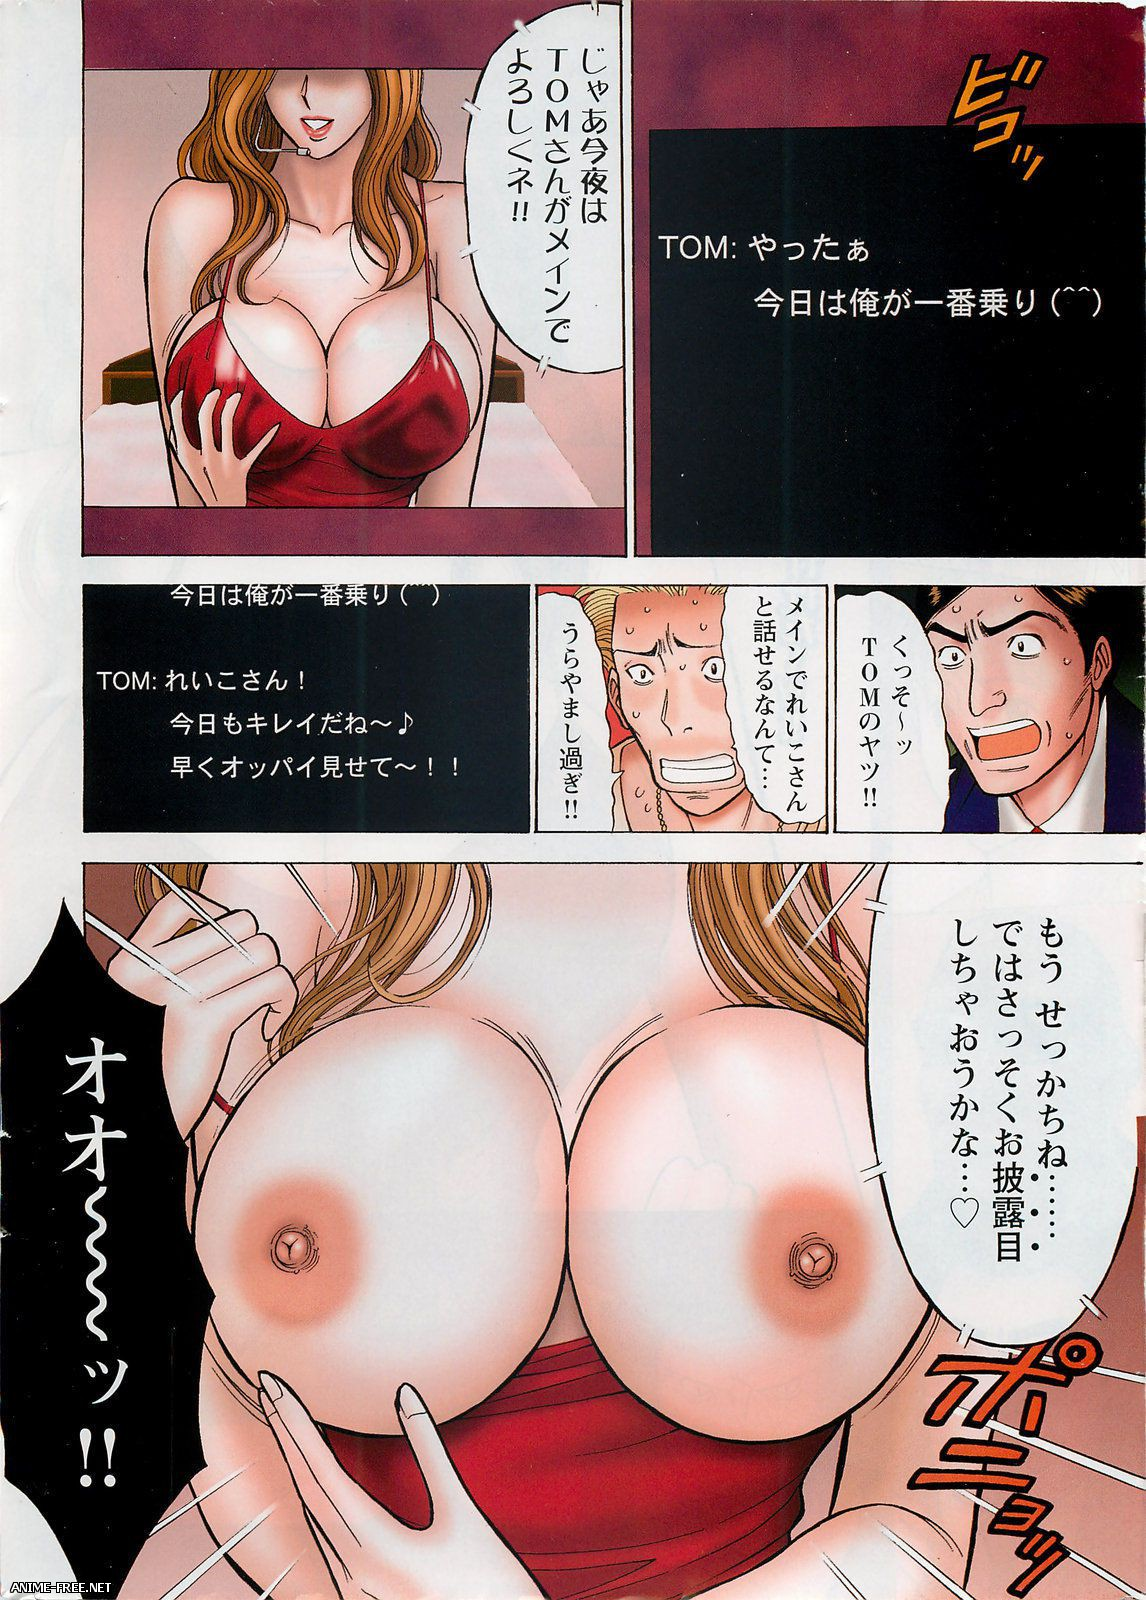 Журнал хентай манги Action Pizazz DX [Cen] [JAP] Manga Hentai